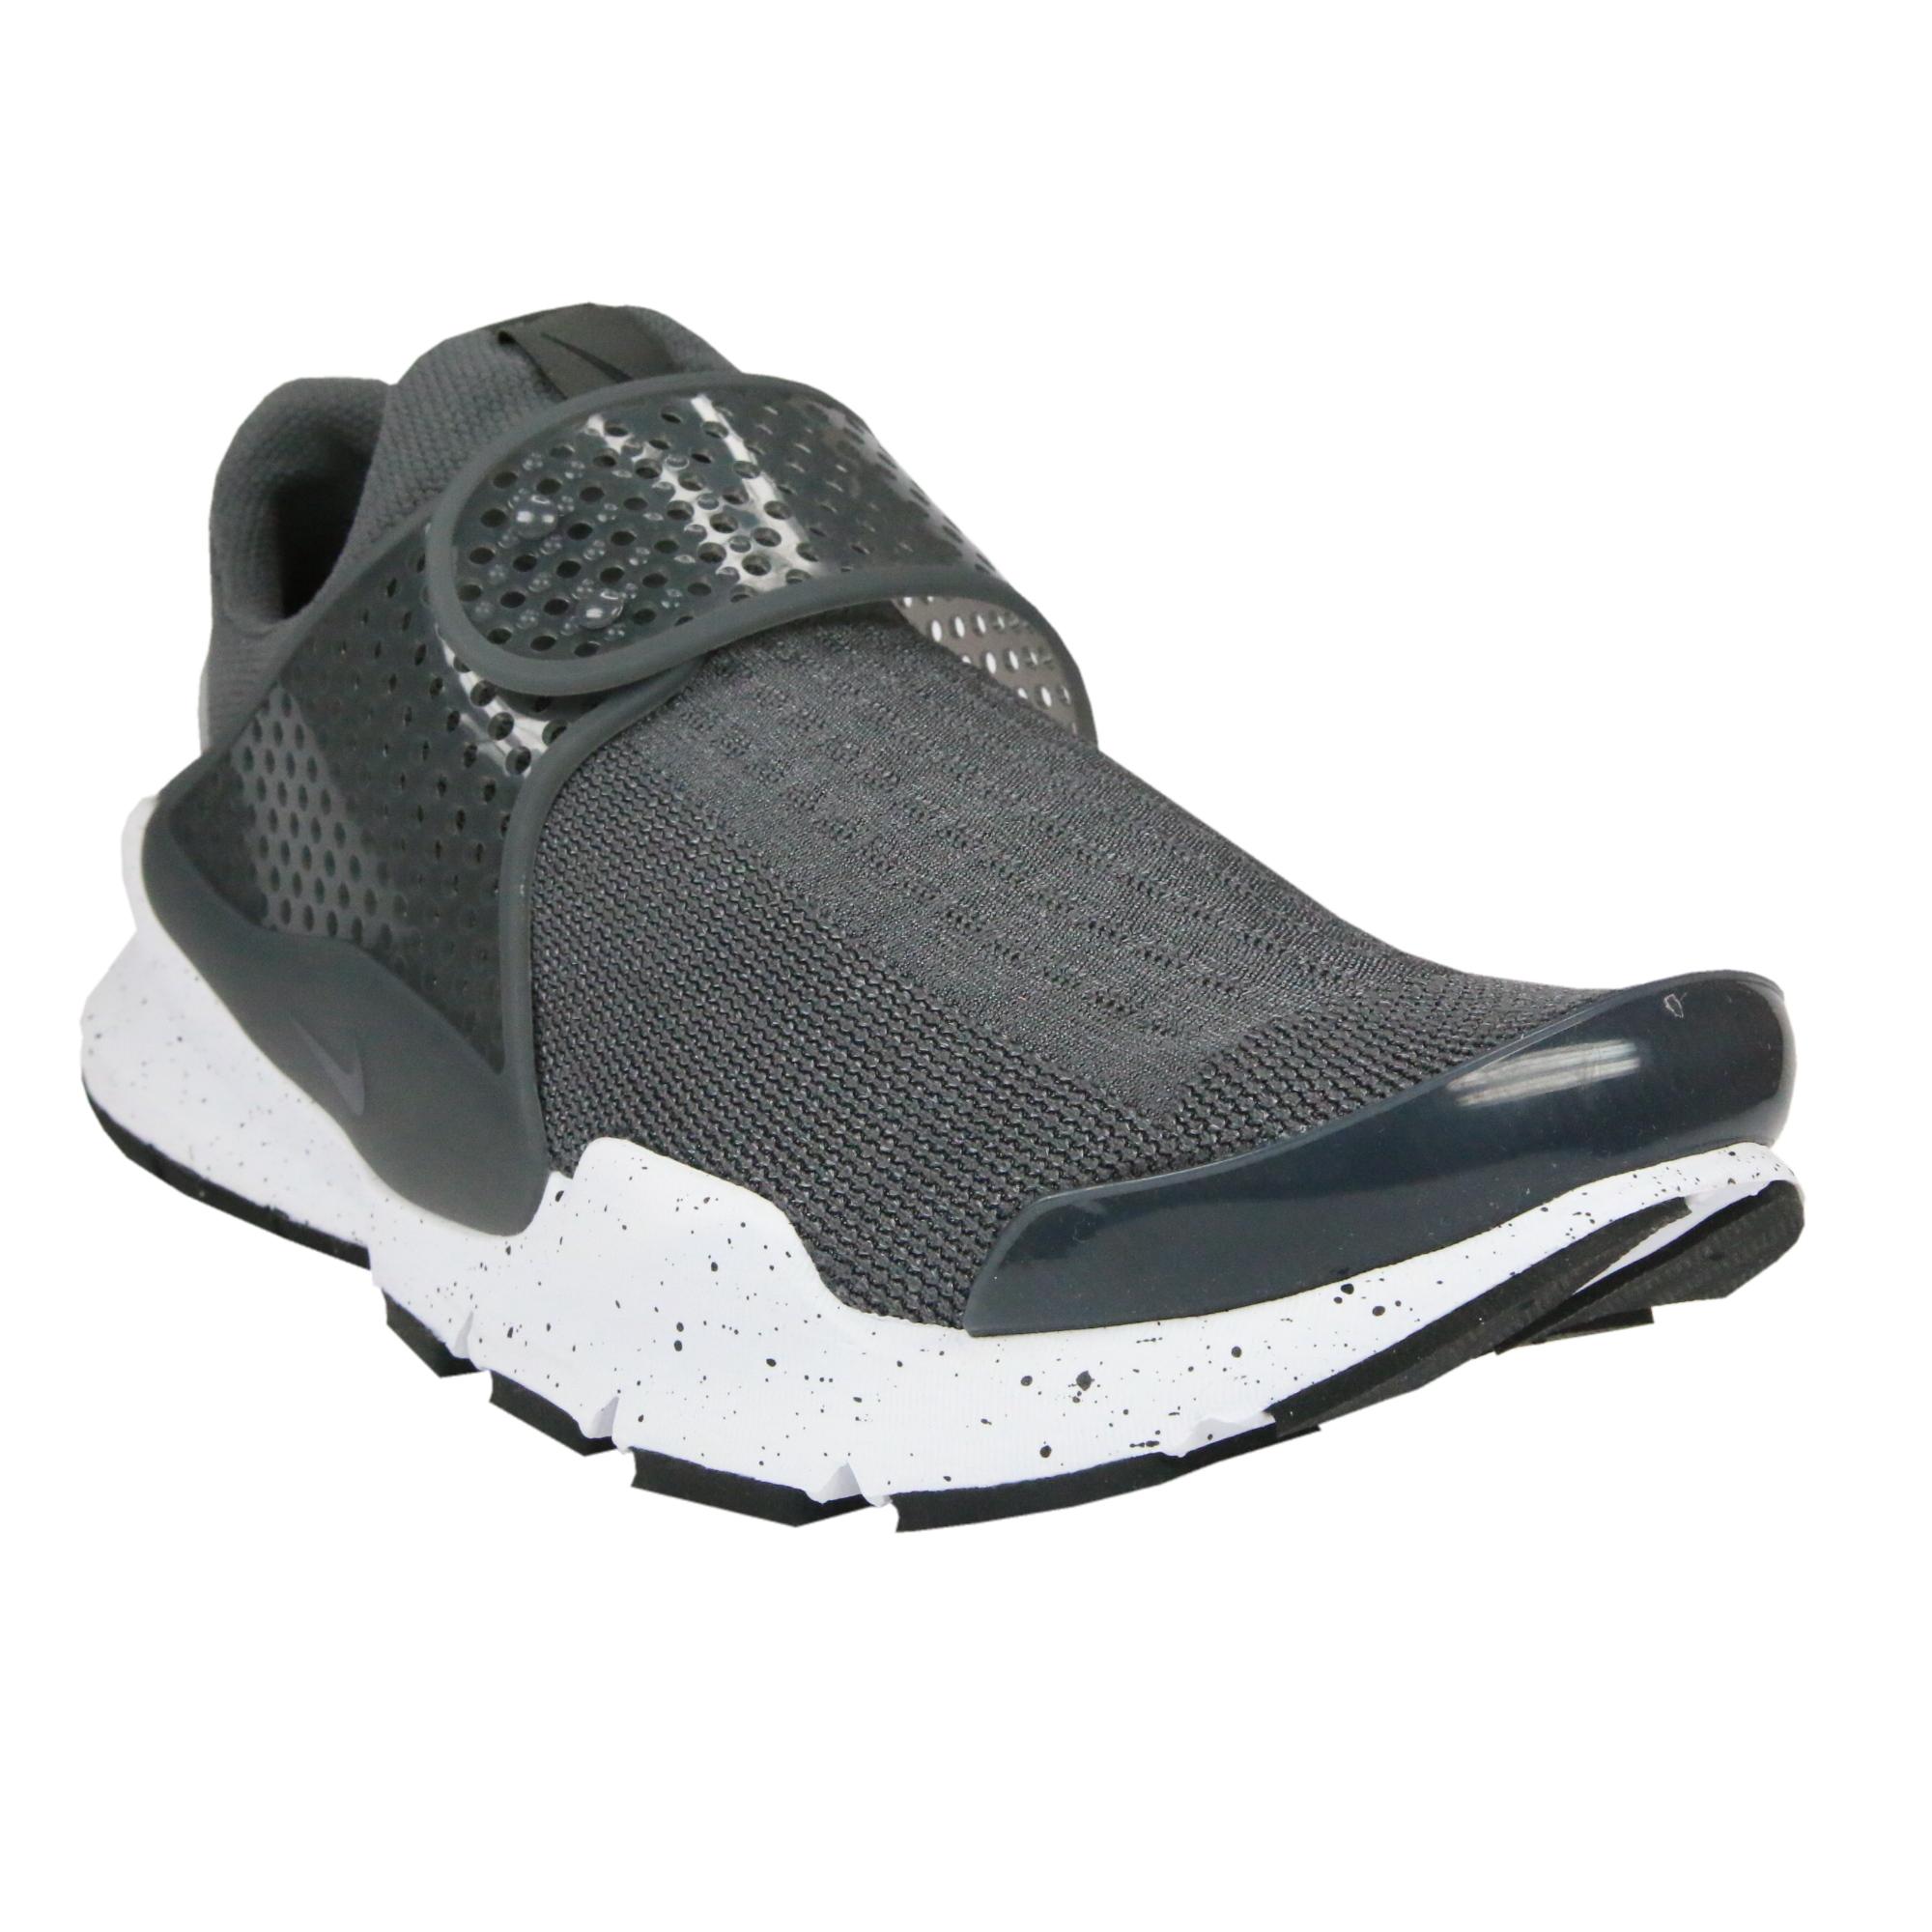 nike sock dart wolf grey schuhe turnschuhe sneaker herren. Black Bedroom Furniture Sets. Home Design Ideas